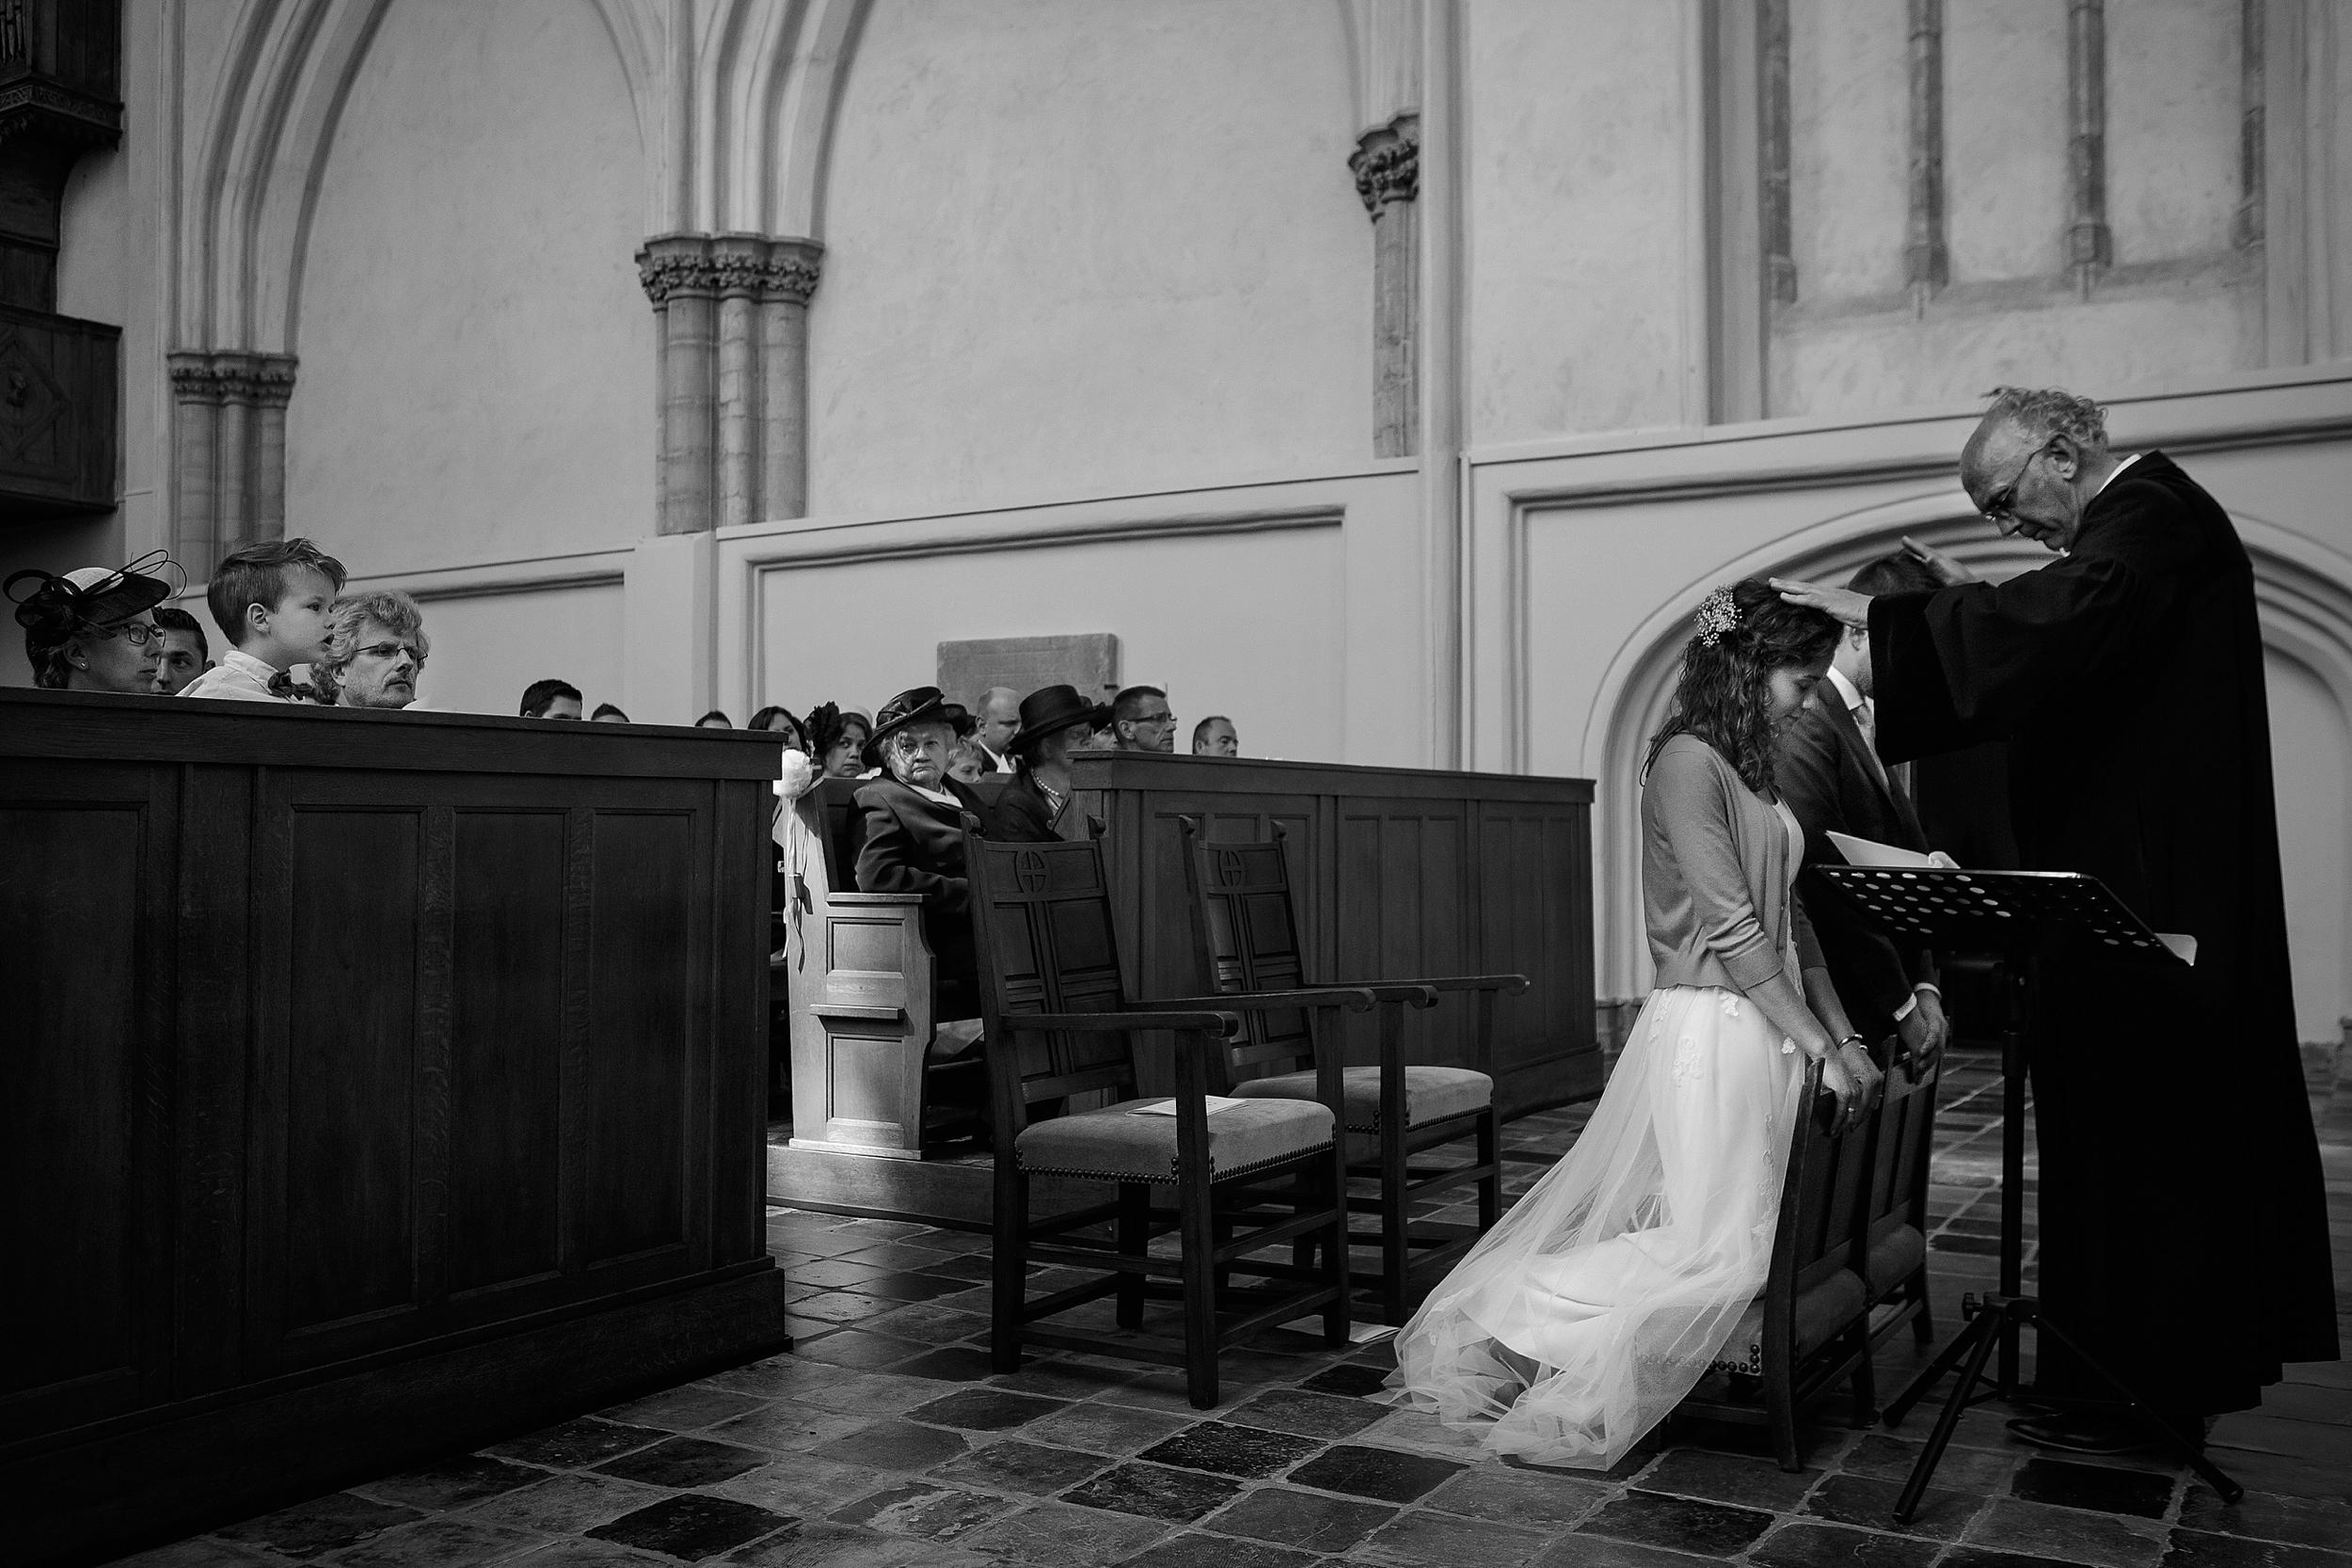 bruidsfotograaf_LNRD_middelburg_kloveniersdoelen_heide_bergen_op_zoom_0628.jpg